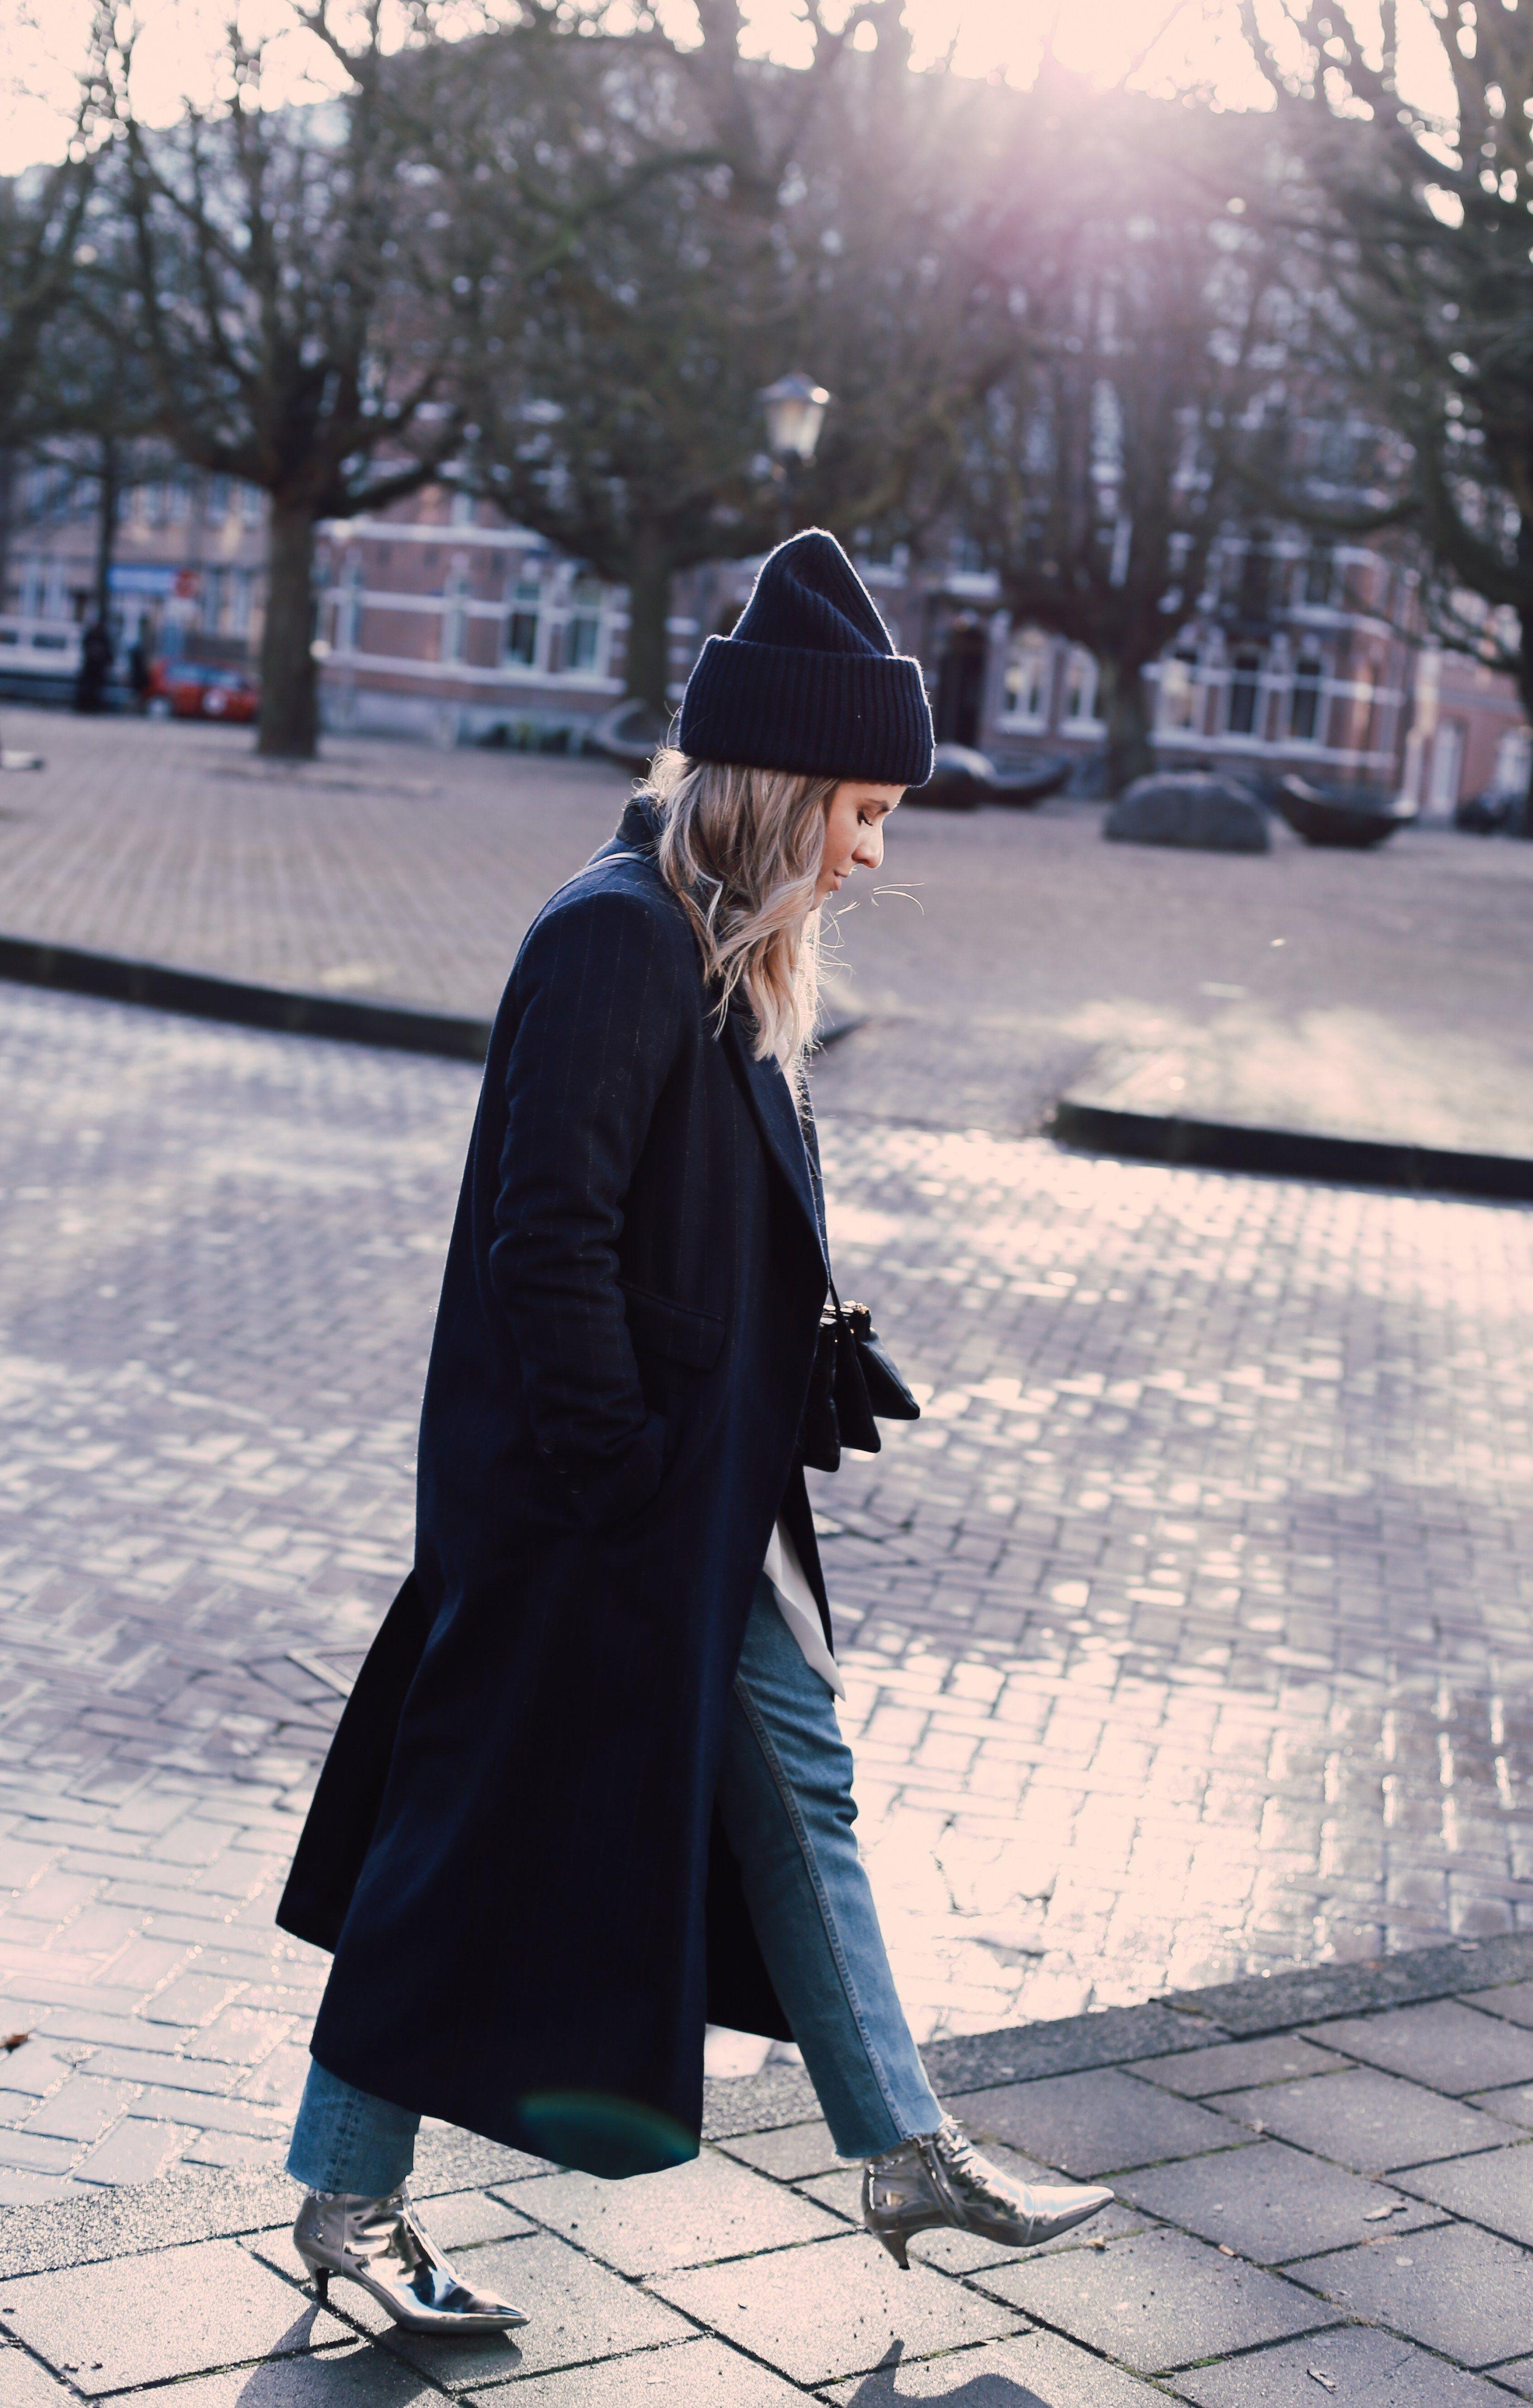 Pin van Marianne Derks op fashion